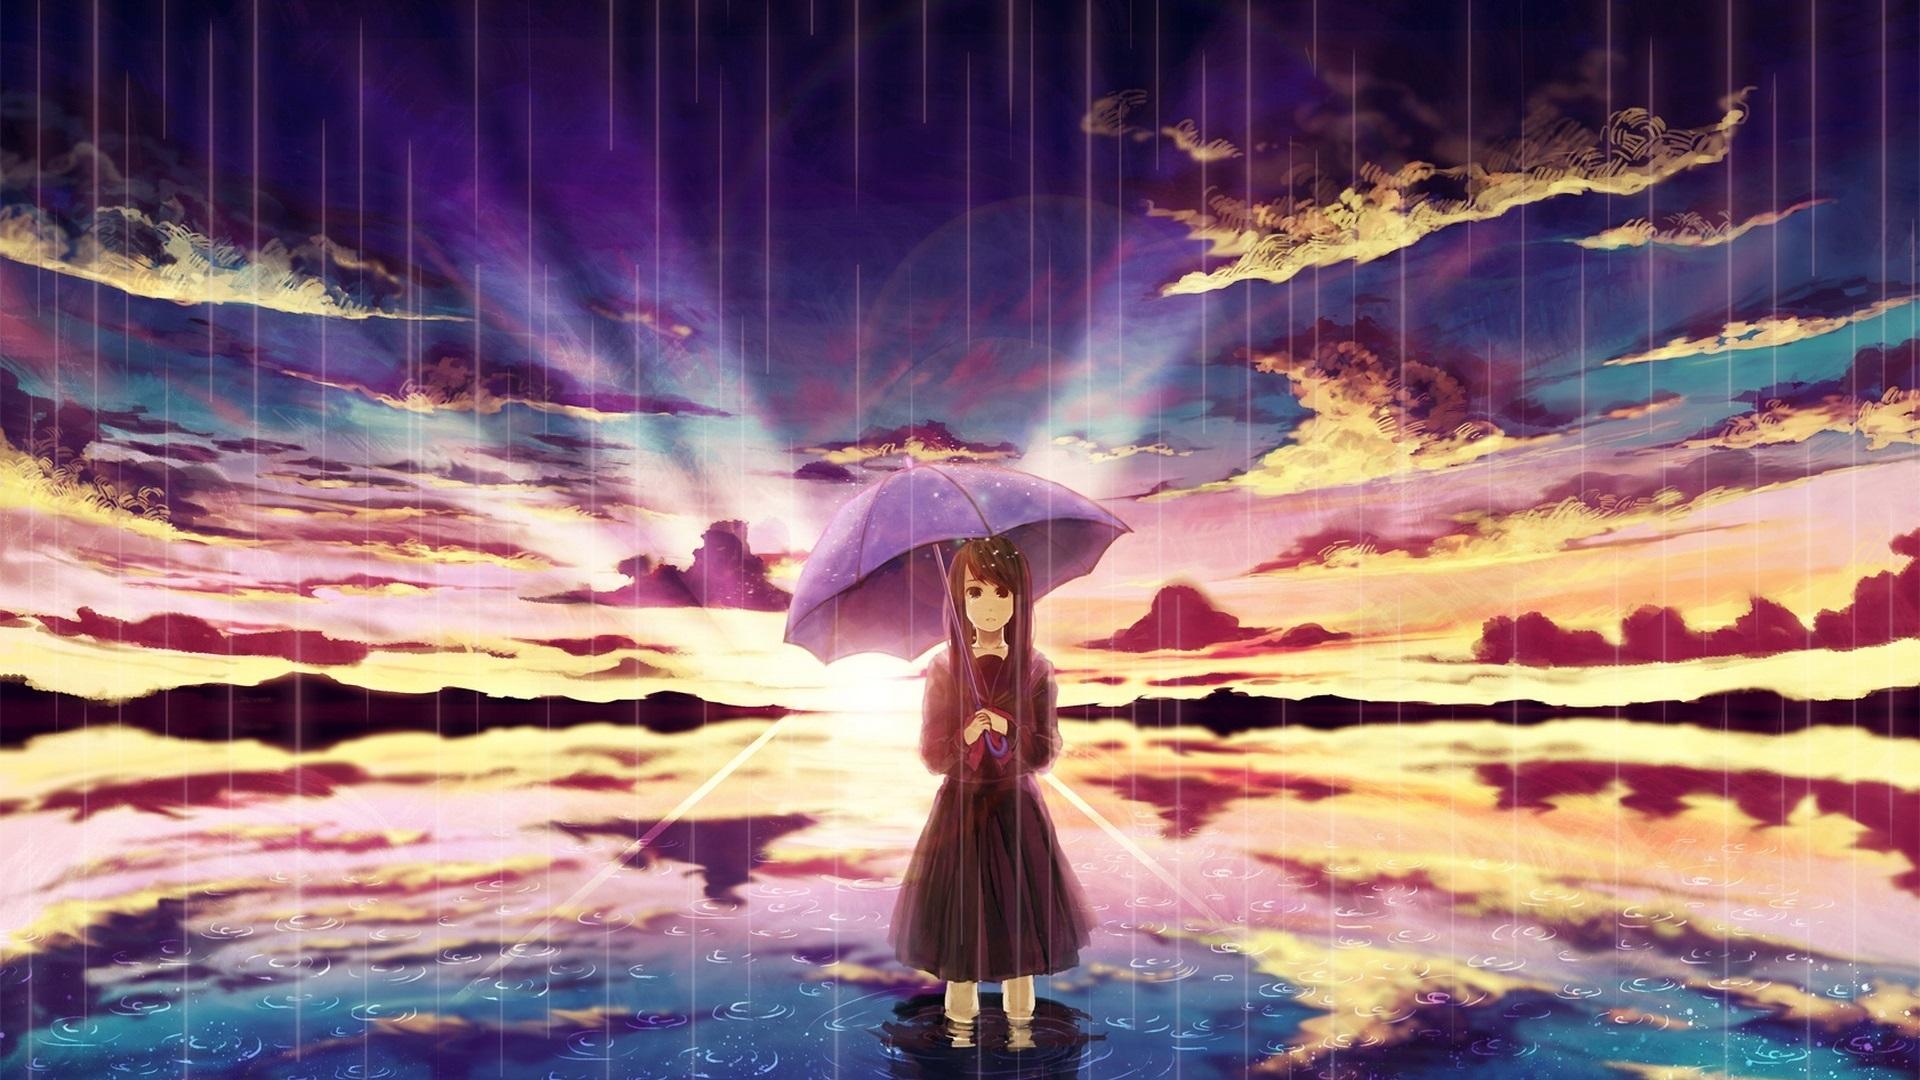 Anime Girl In Rain Umbrella Water Clouds Sunset 640x1136 Iphone